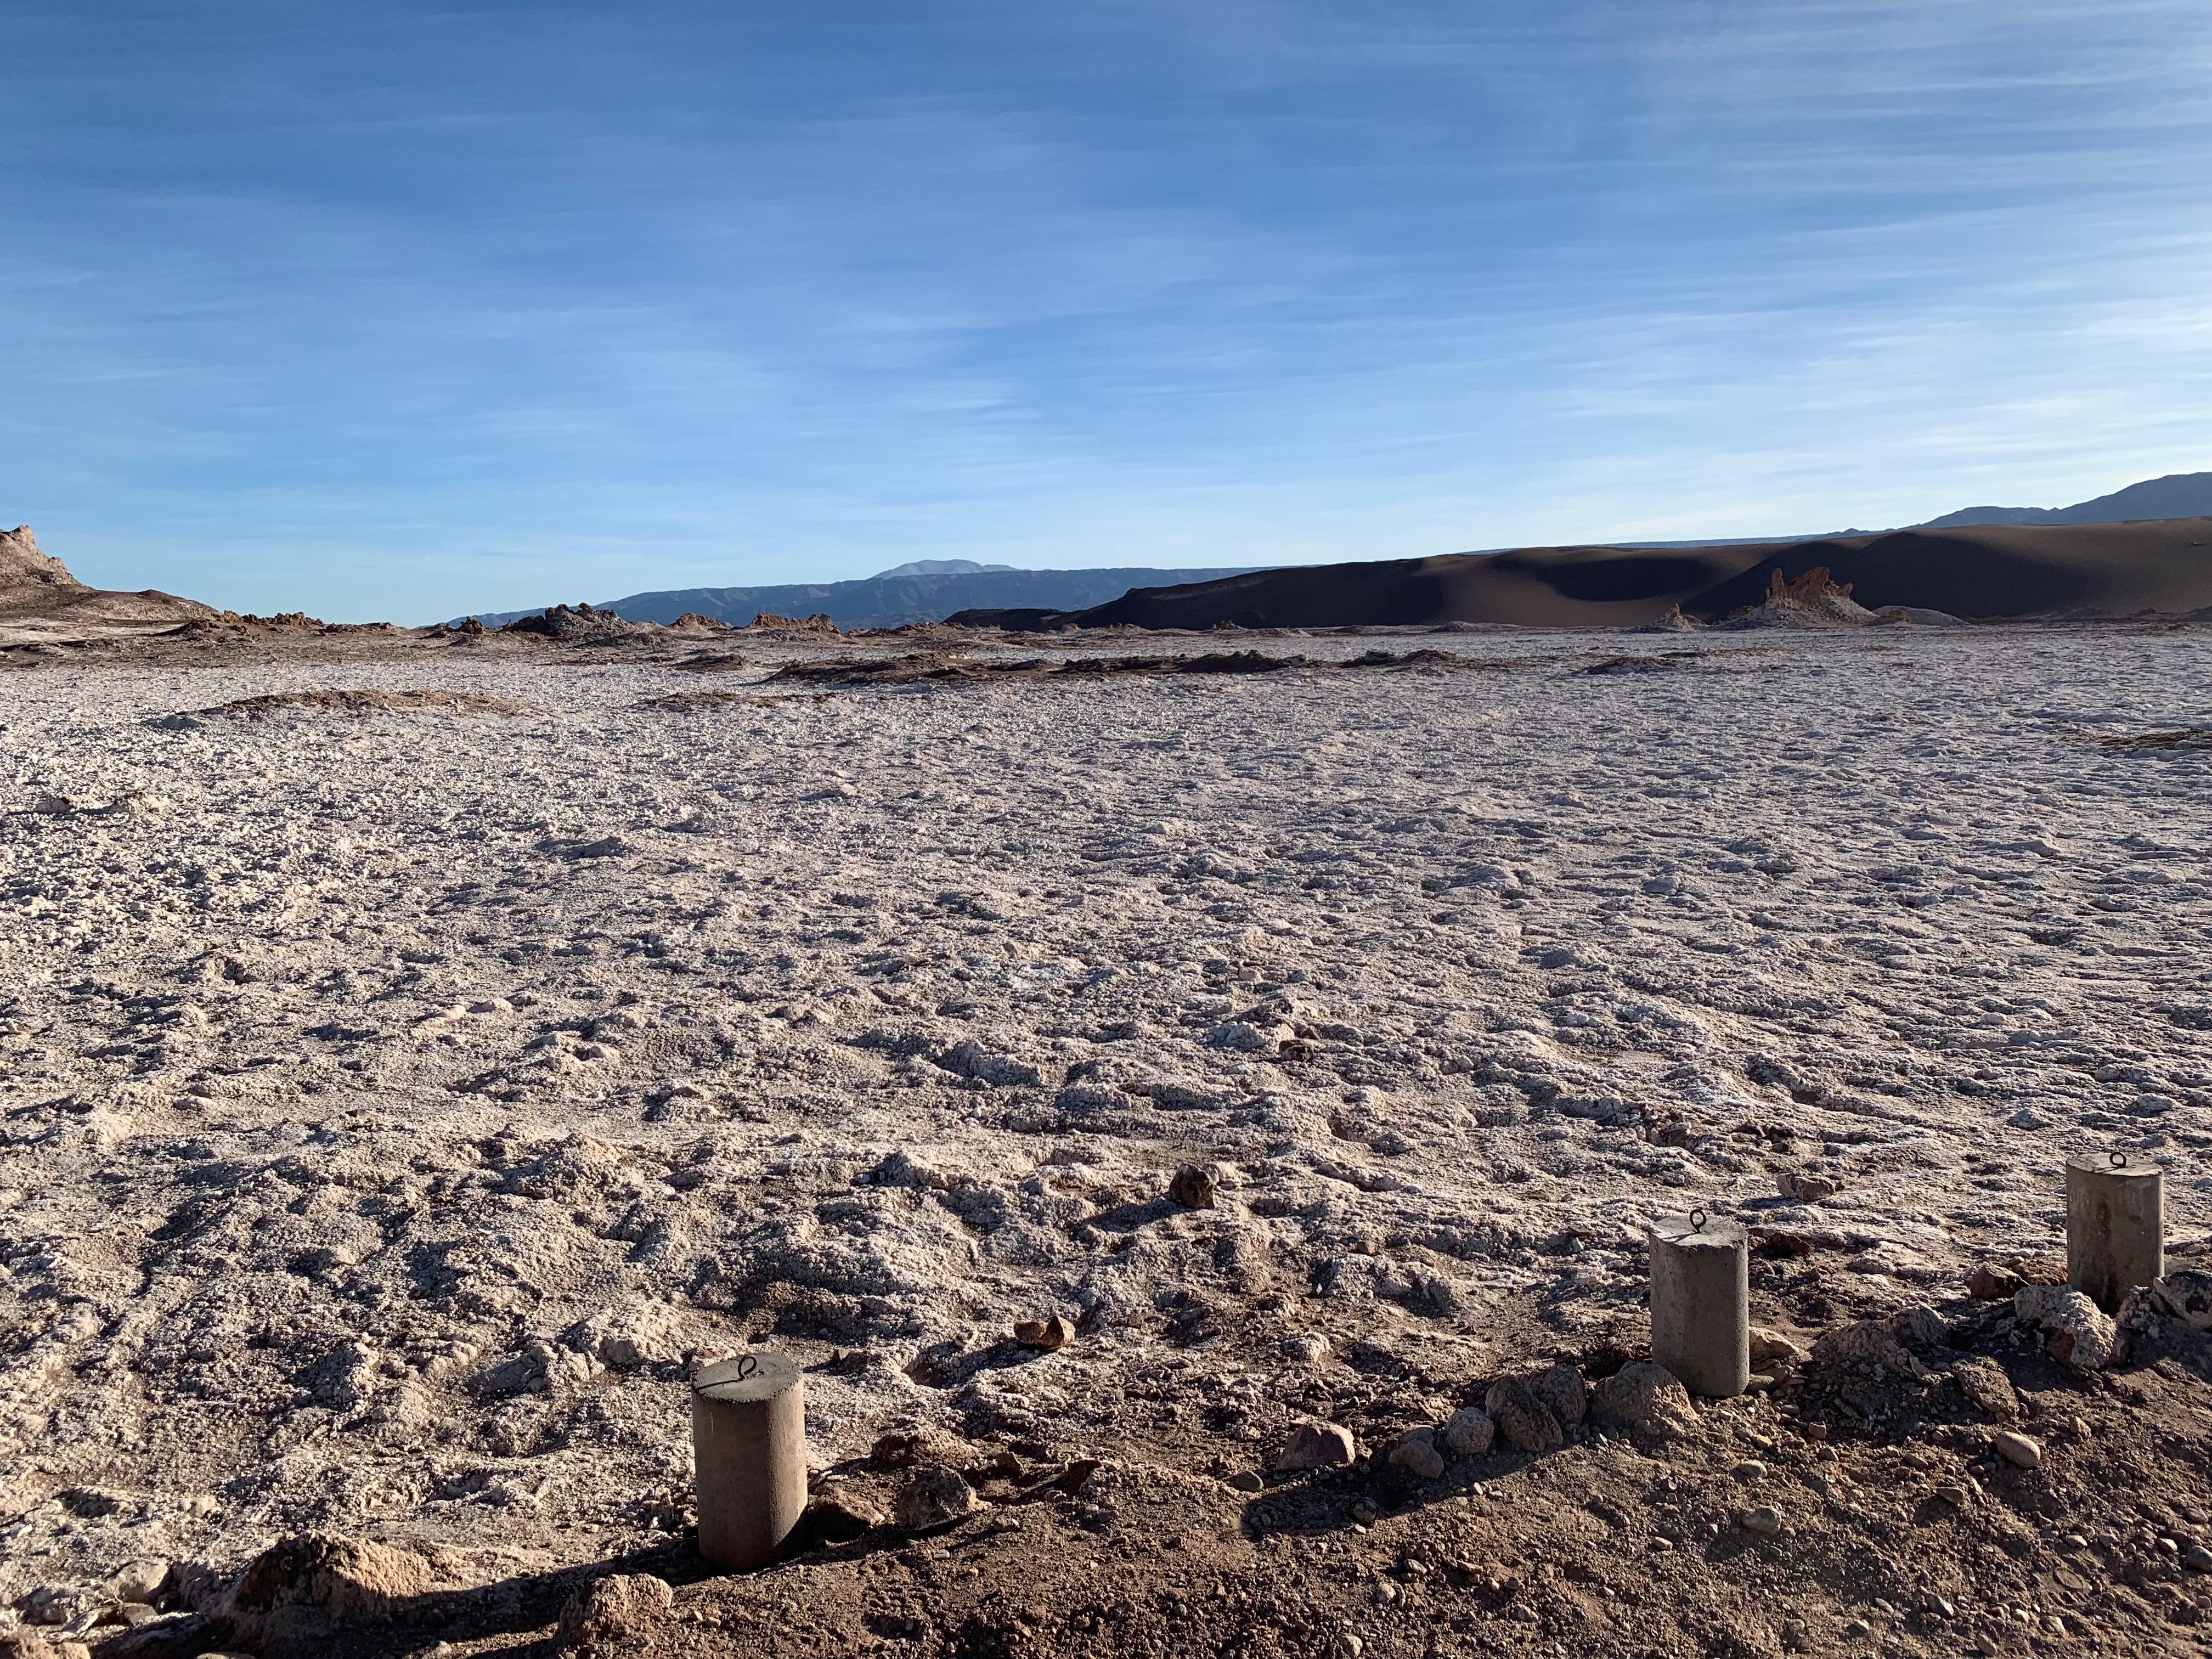 http://meineko.sakura.ne.jp/Chile/Chile-6-Atacama.JPG